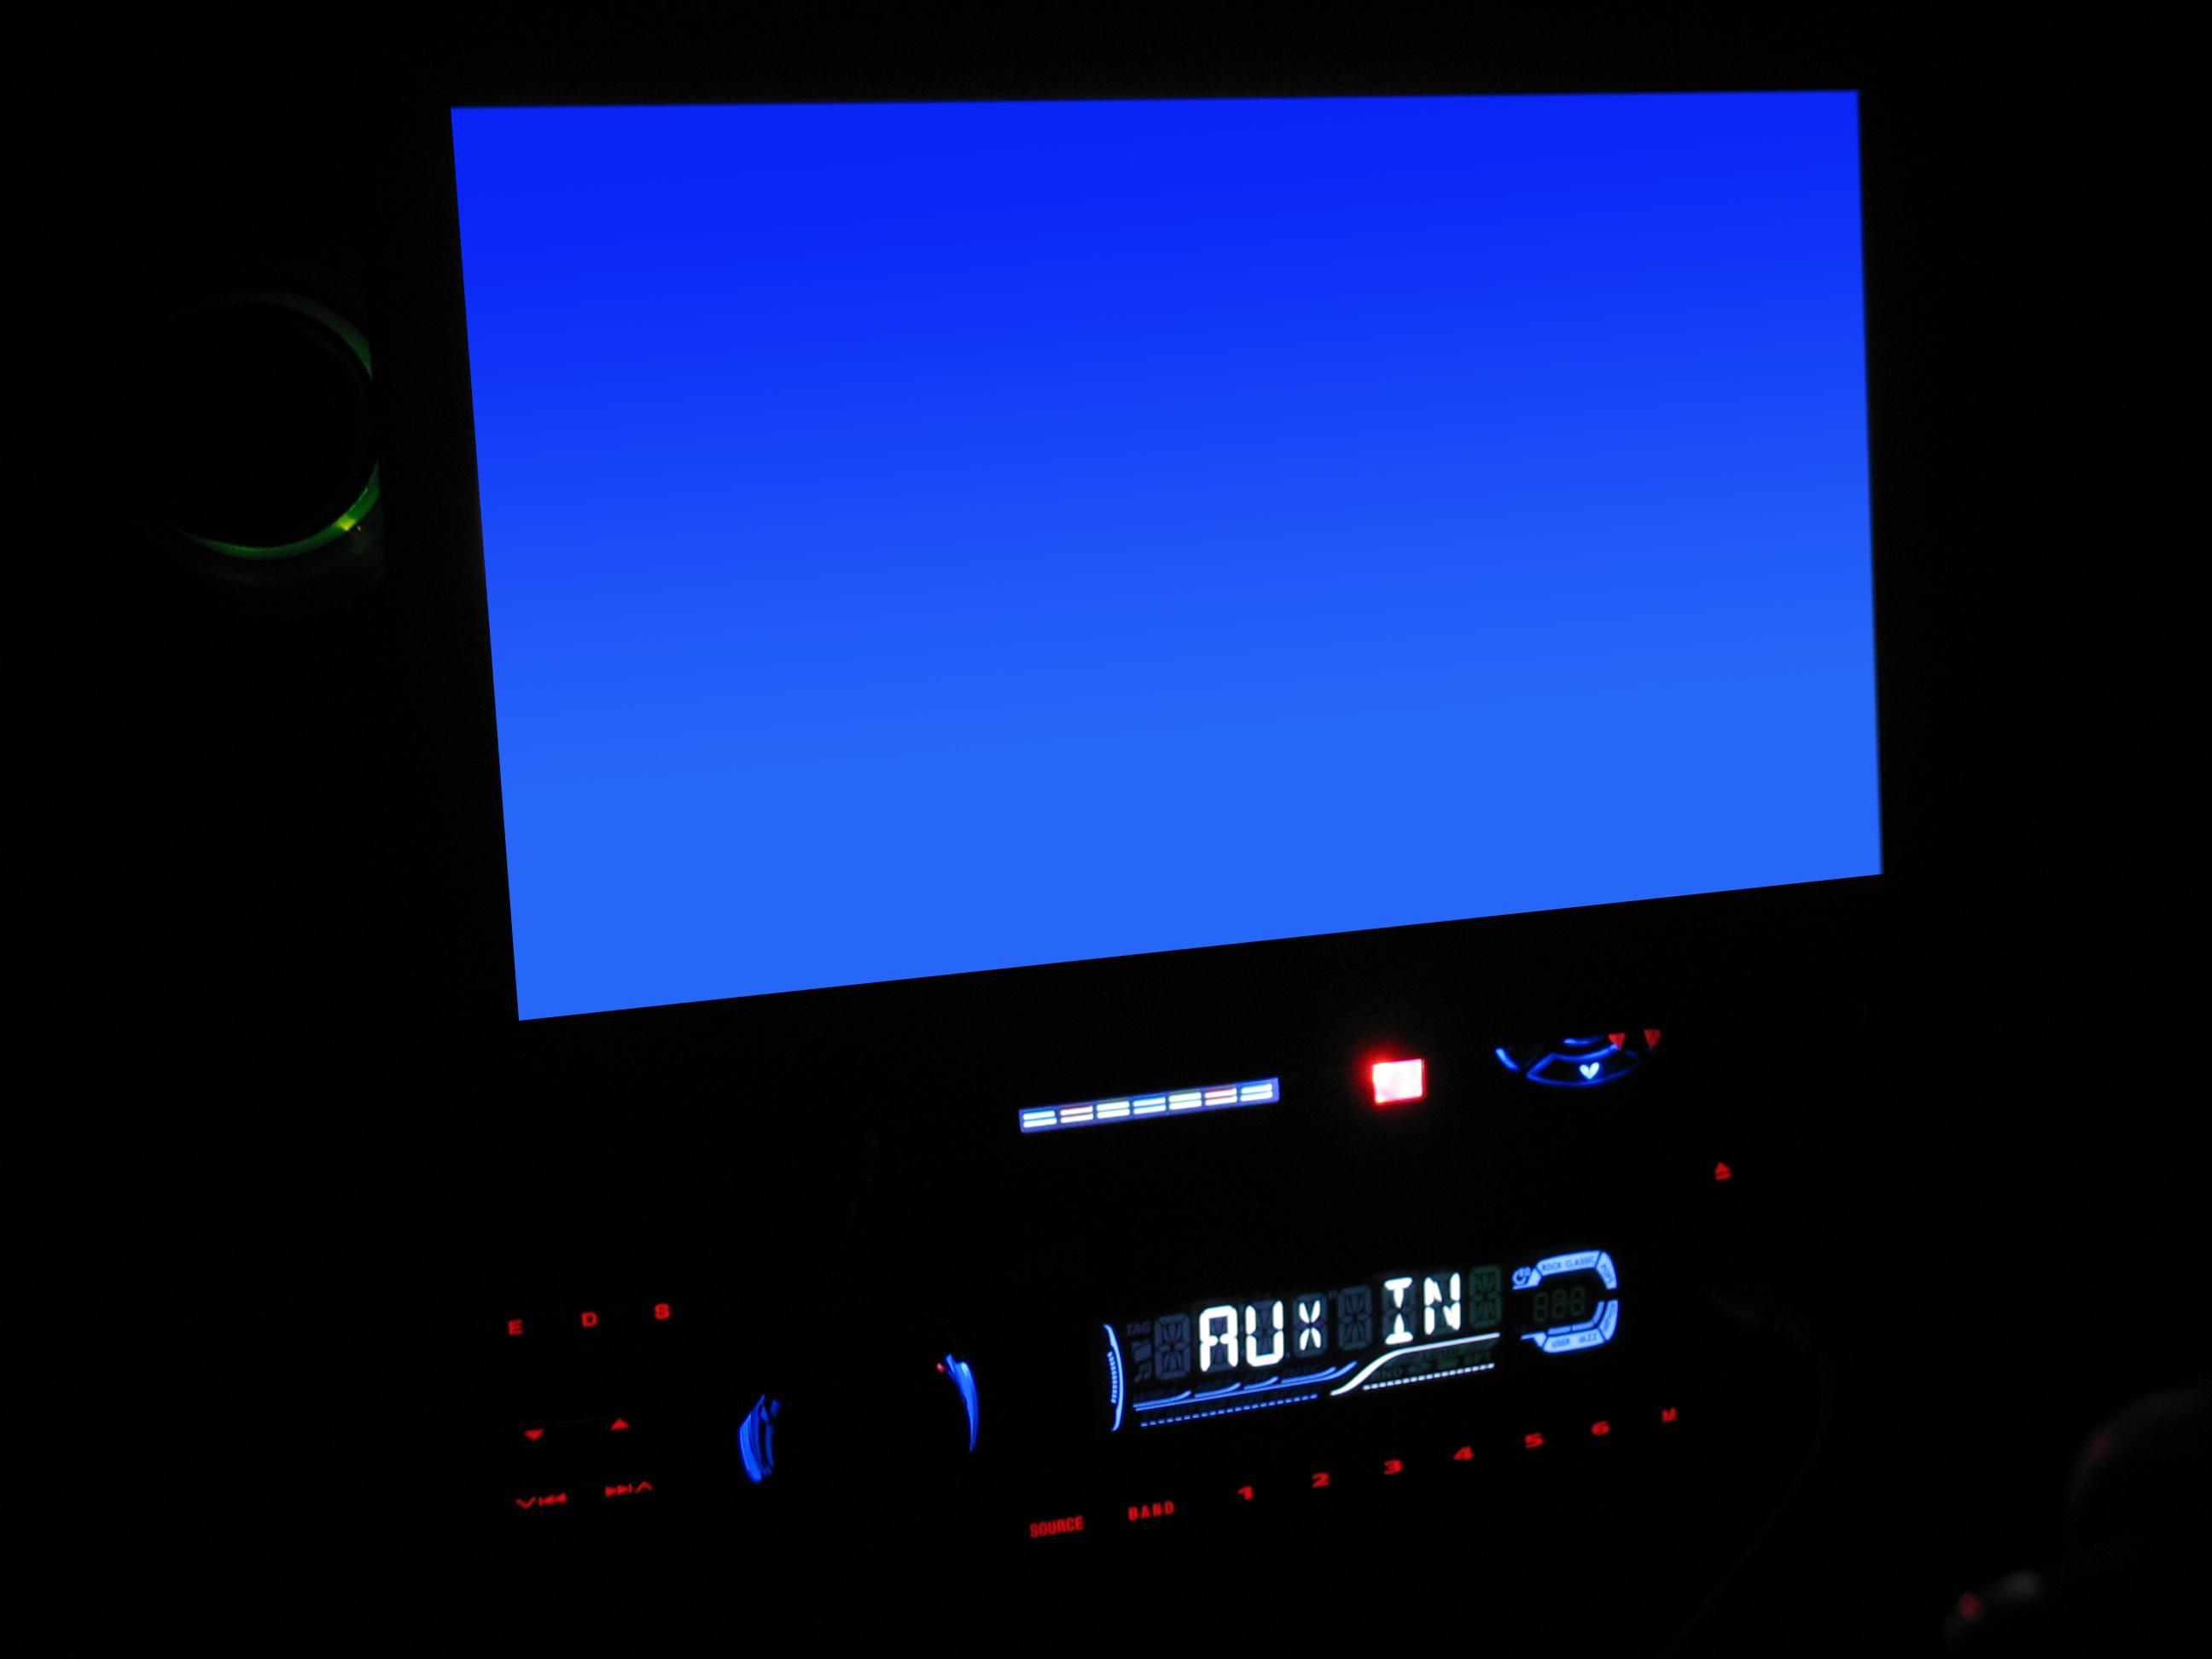 Car Navigation System-Blue Screen